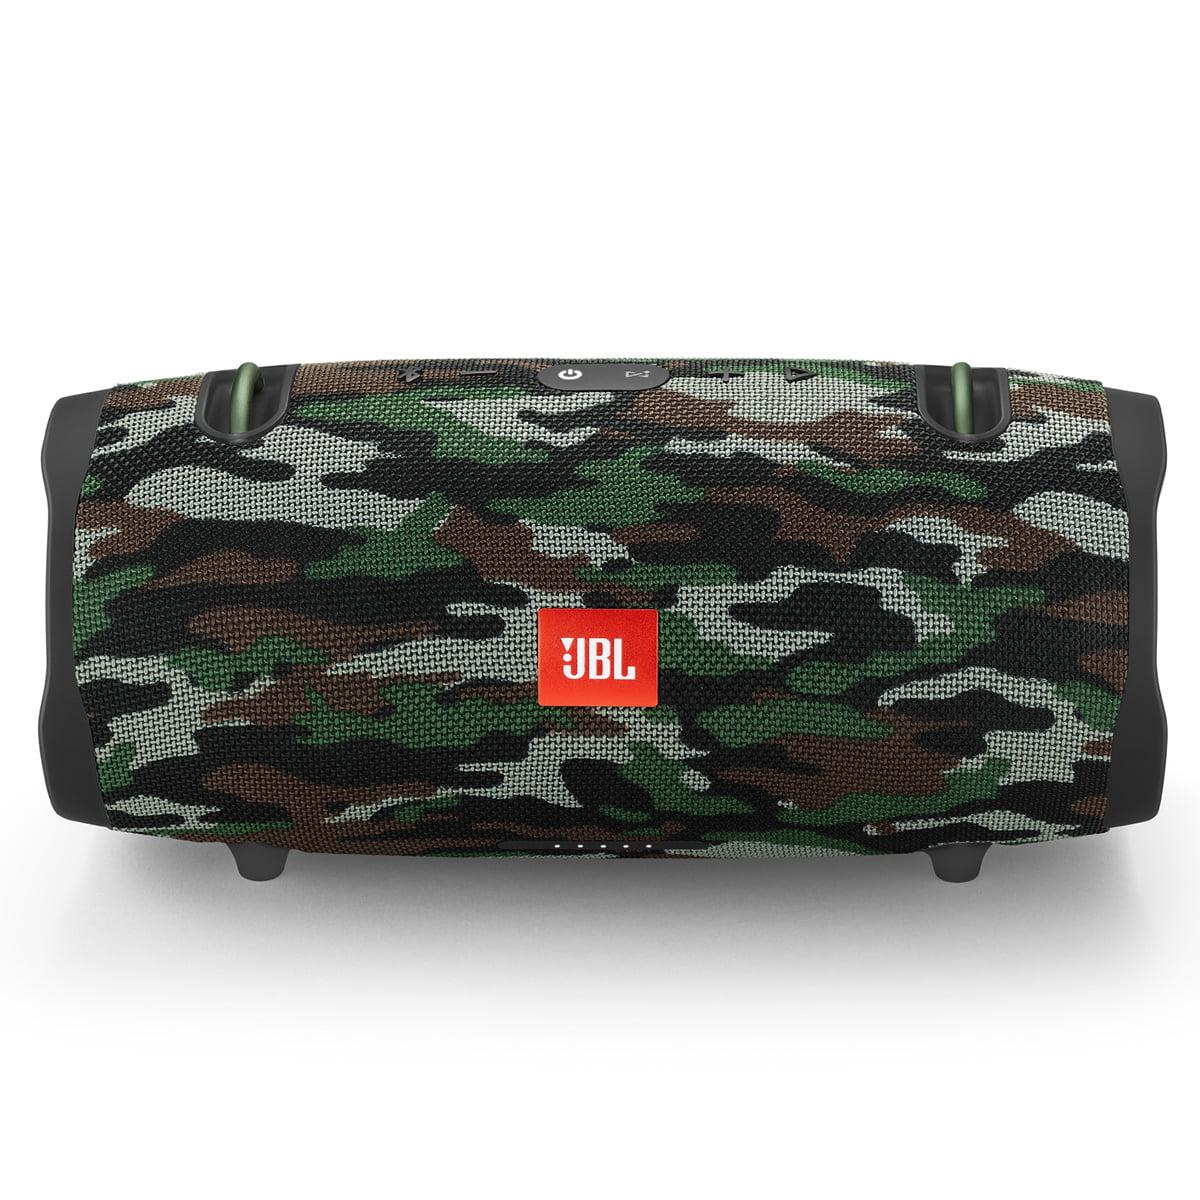 JBL Xtreme 2 Camouflage Portable Bluetooth Speaker